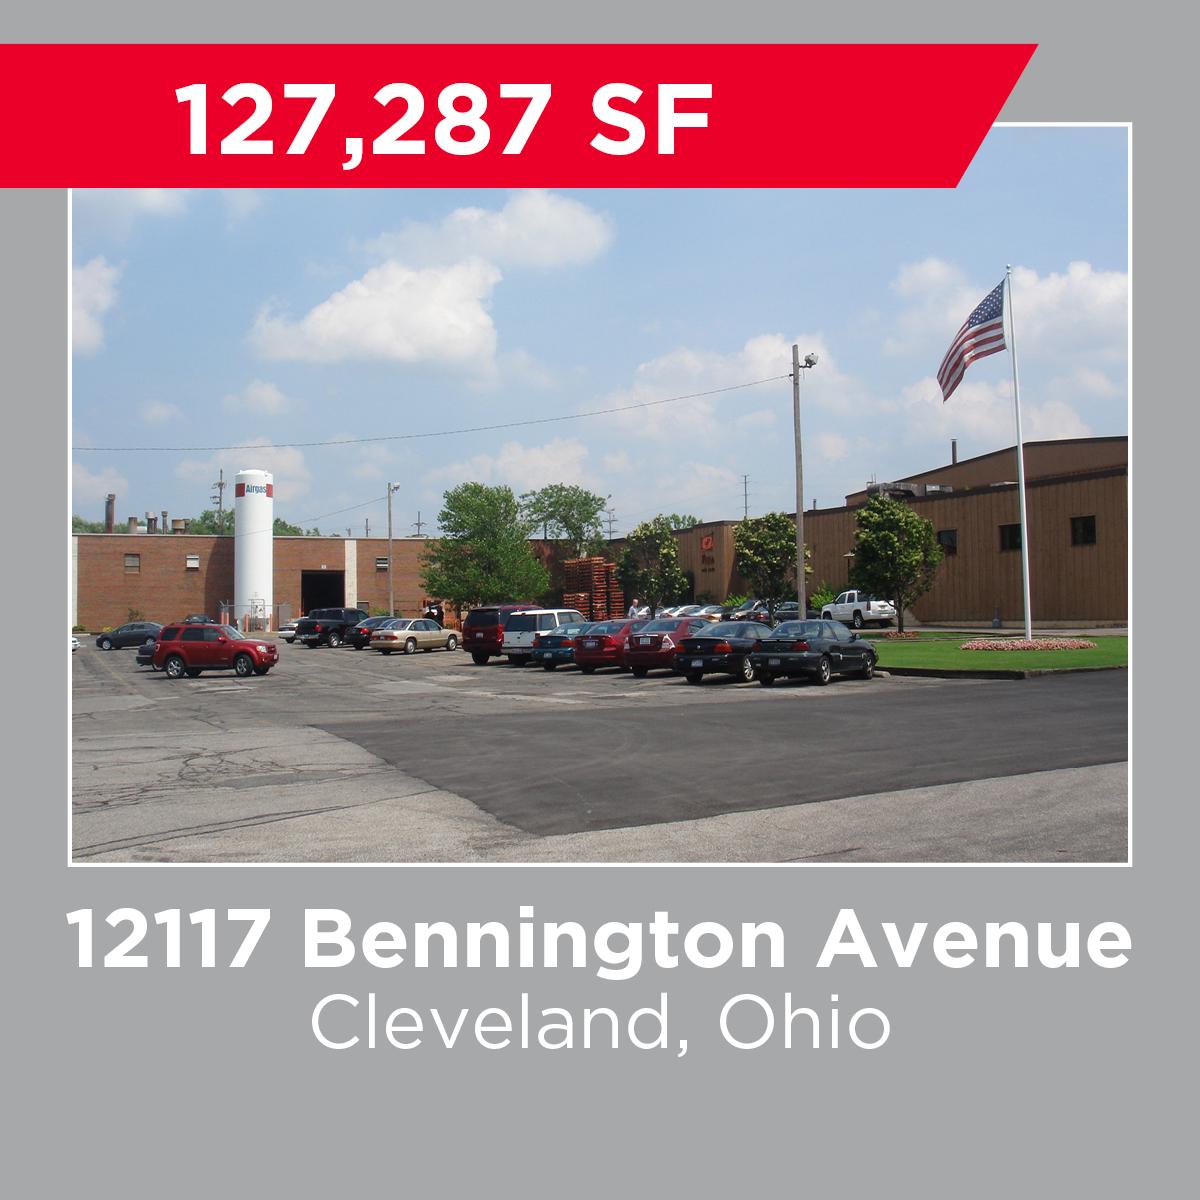 12117 Bennington Avenue.jpg